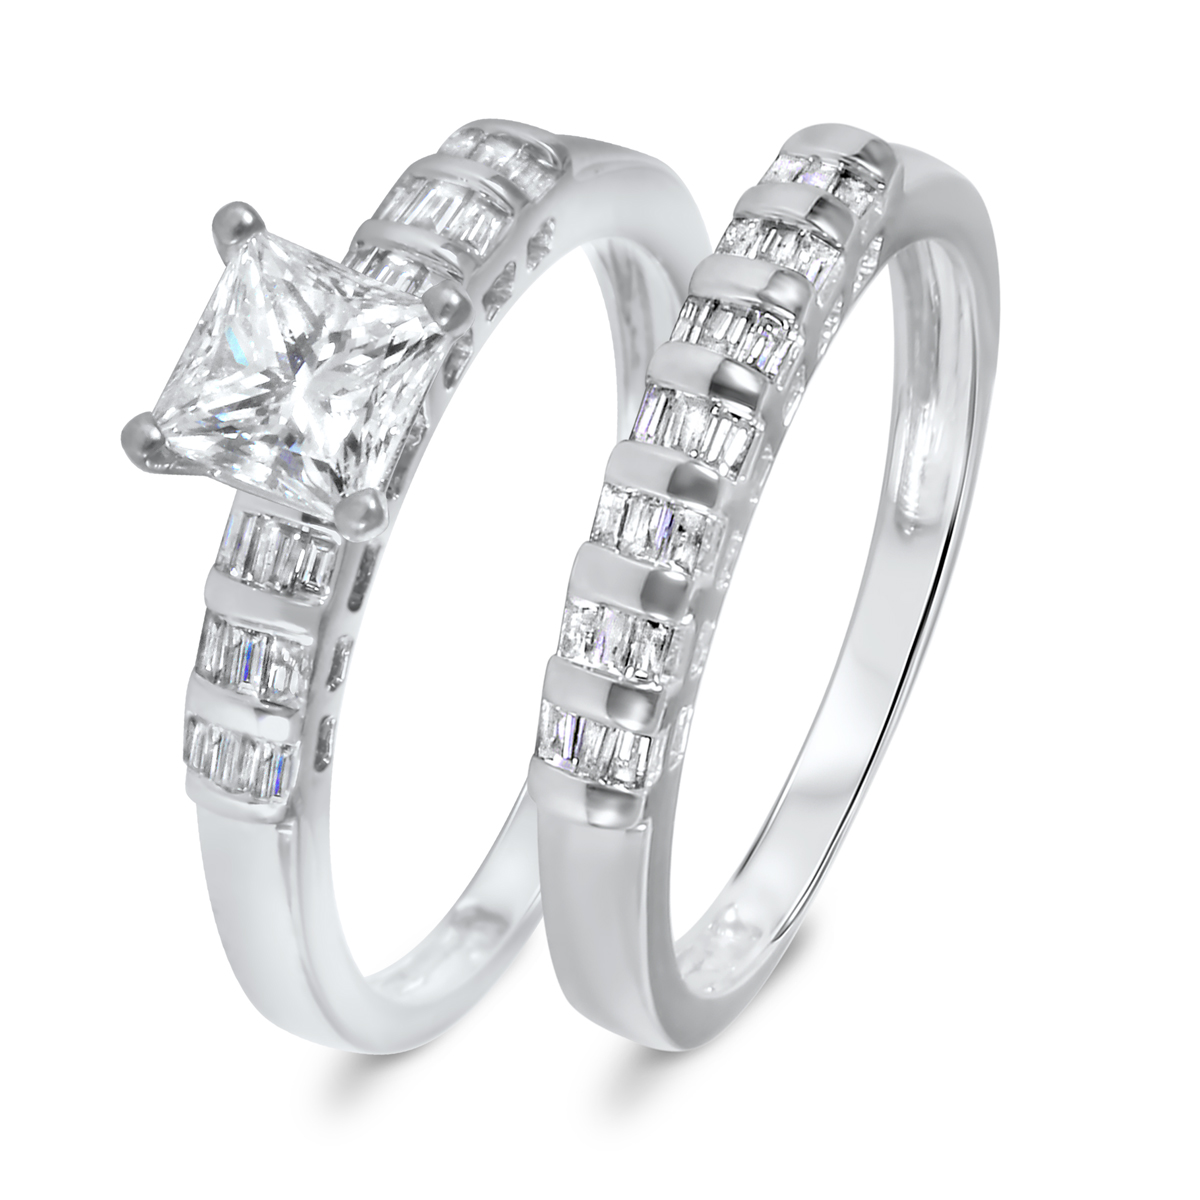 1 1/2 CT. T.W. Diamond Women's Bridal Wedding Ring Set 10K White Gold